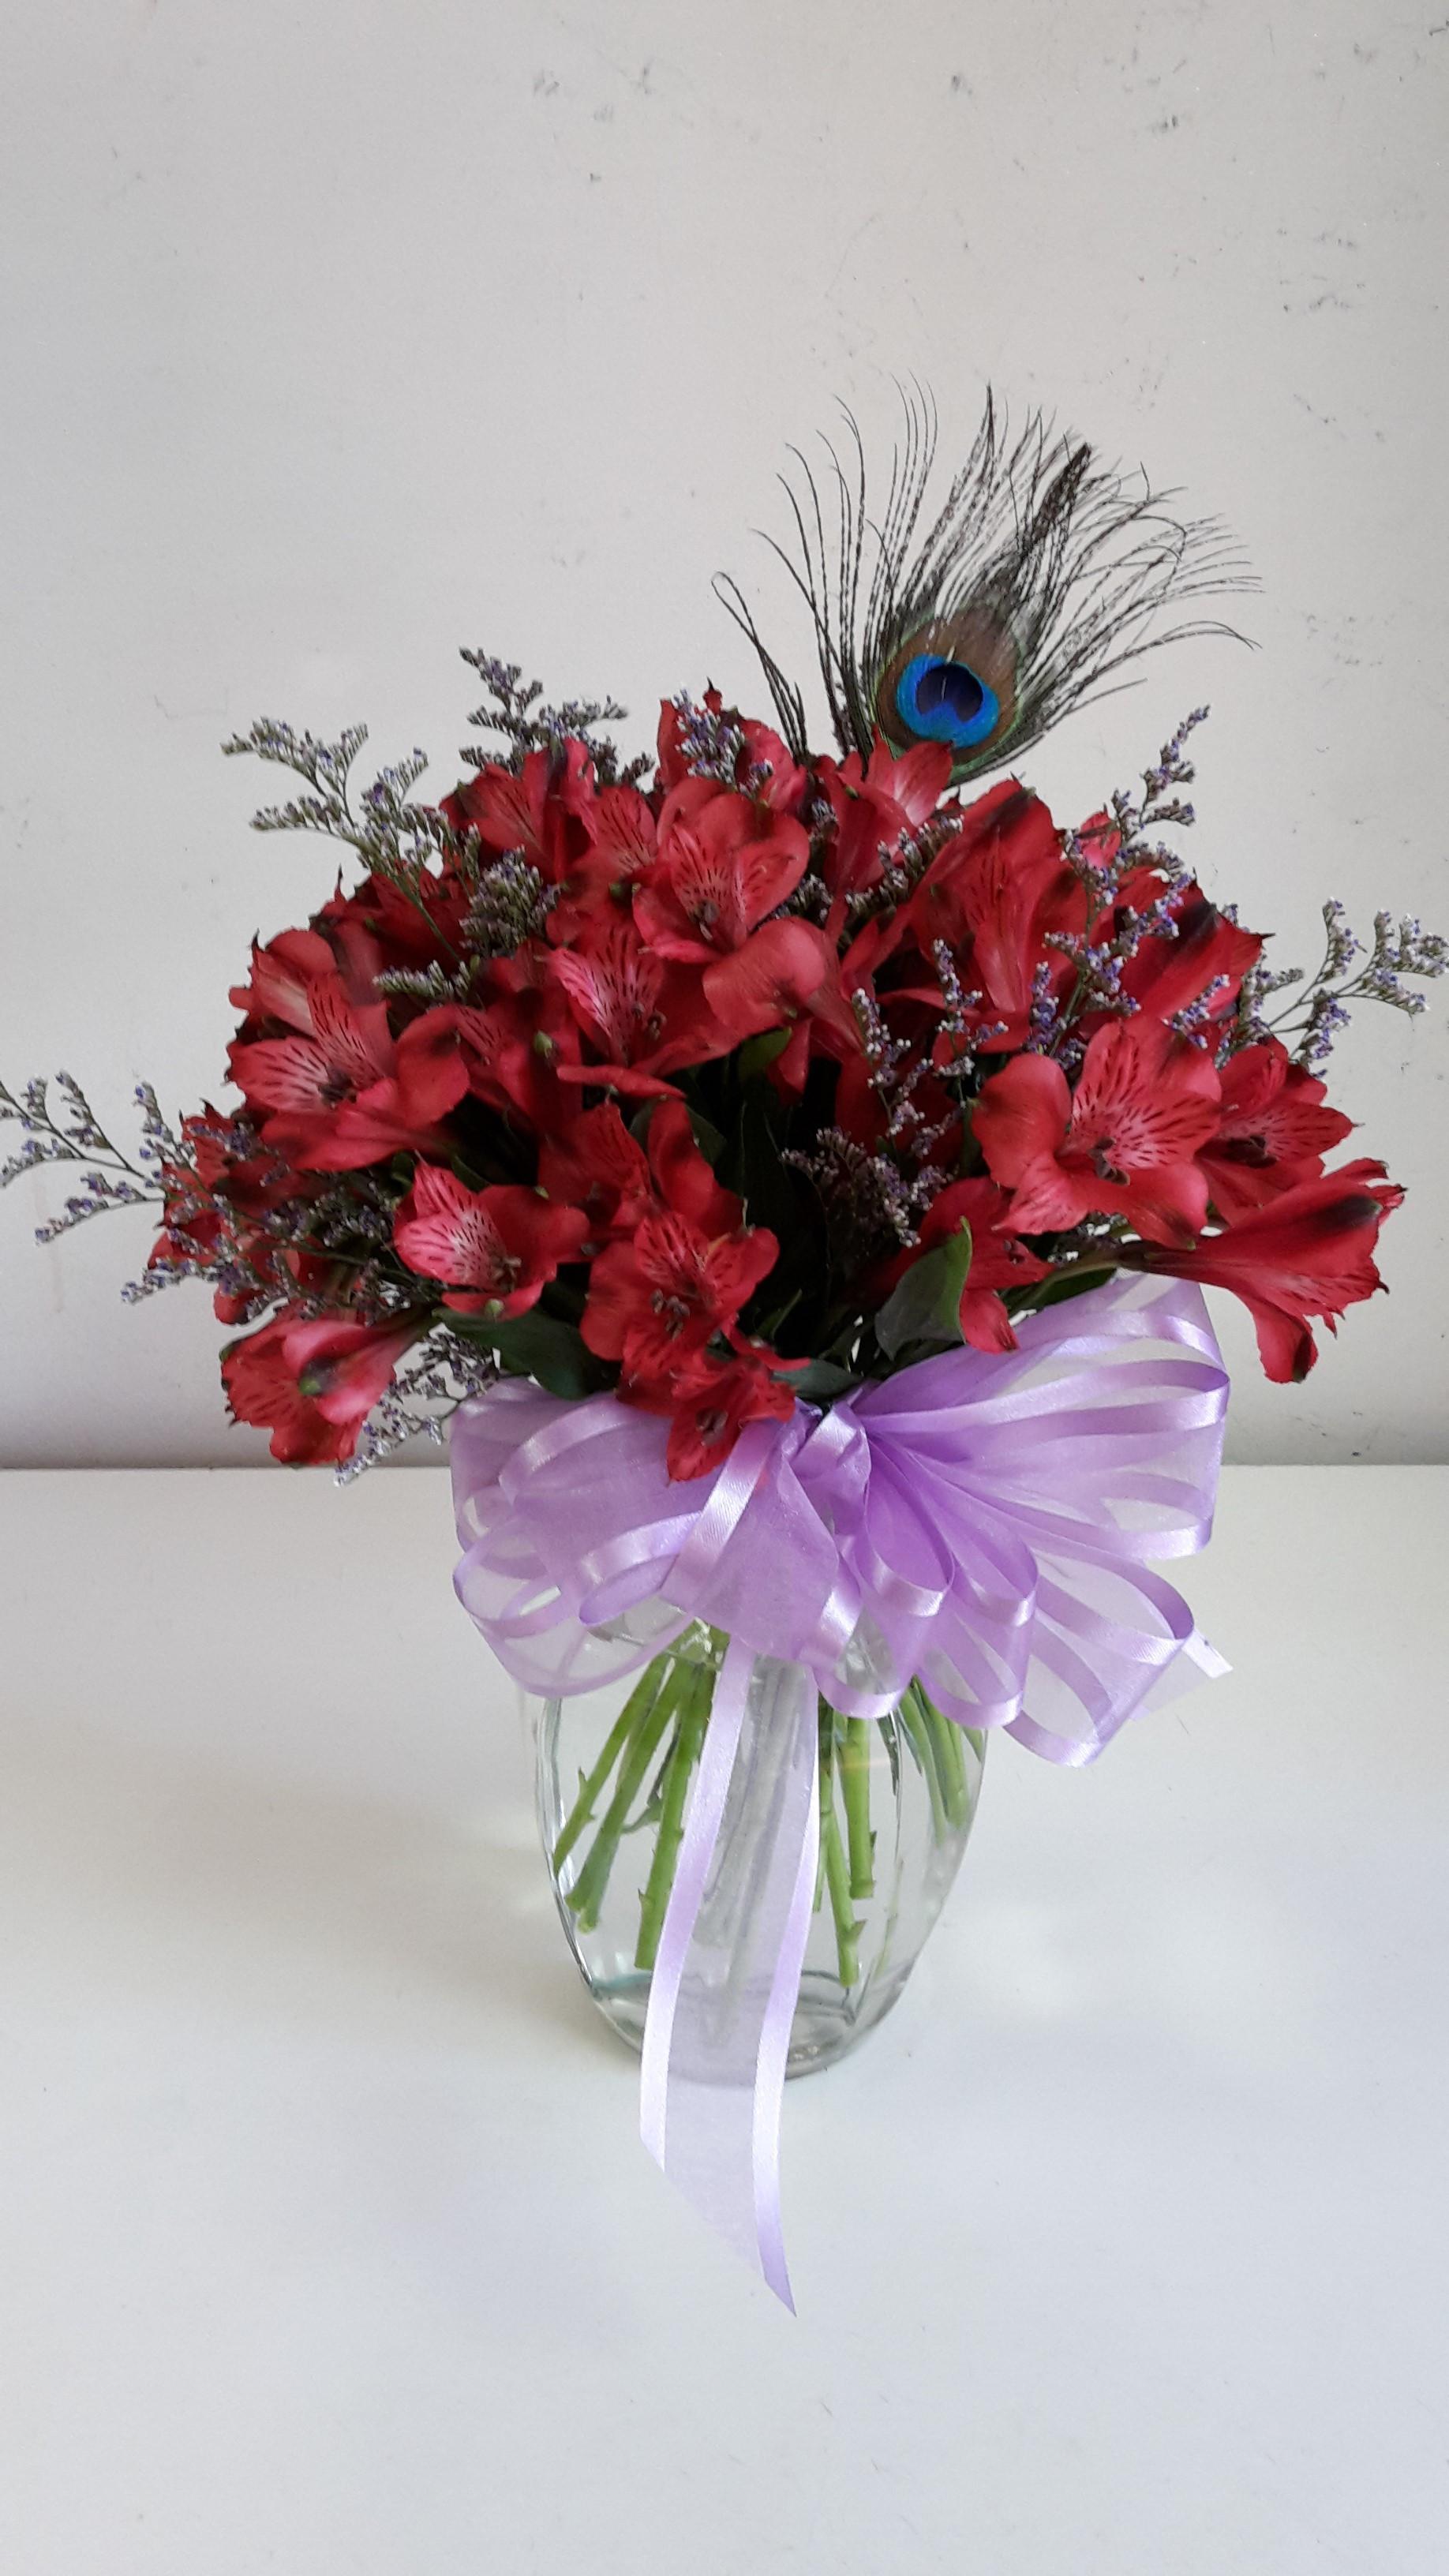 Headstone Vase Flower Arrangements Of Elk City Florist Flower Delivery by Broadway Flowers with Regard to Peacock Alstroemeria